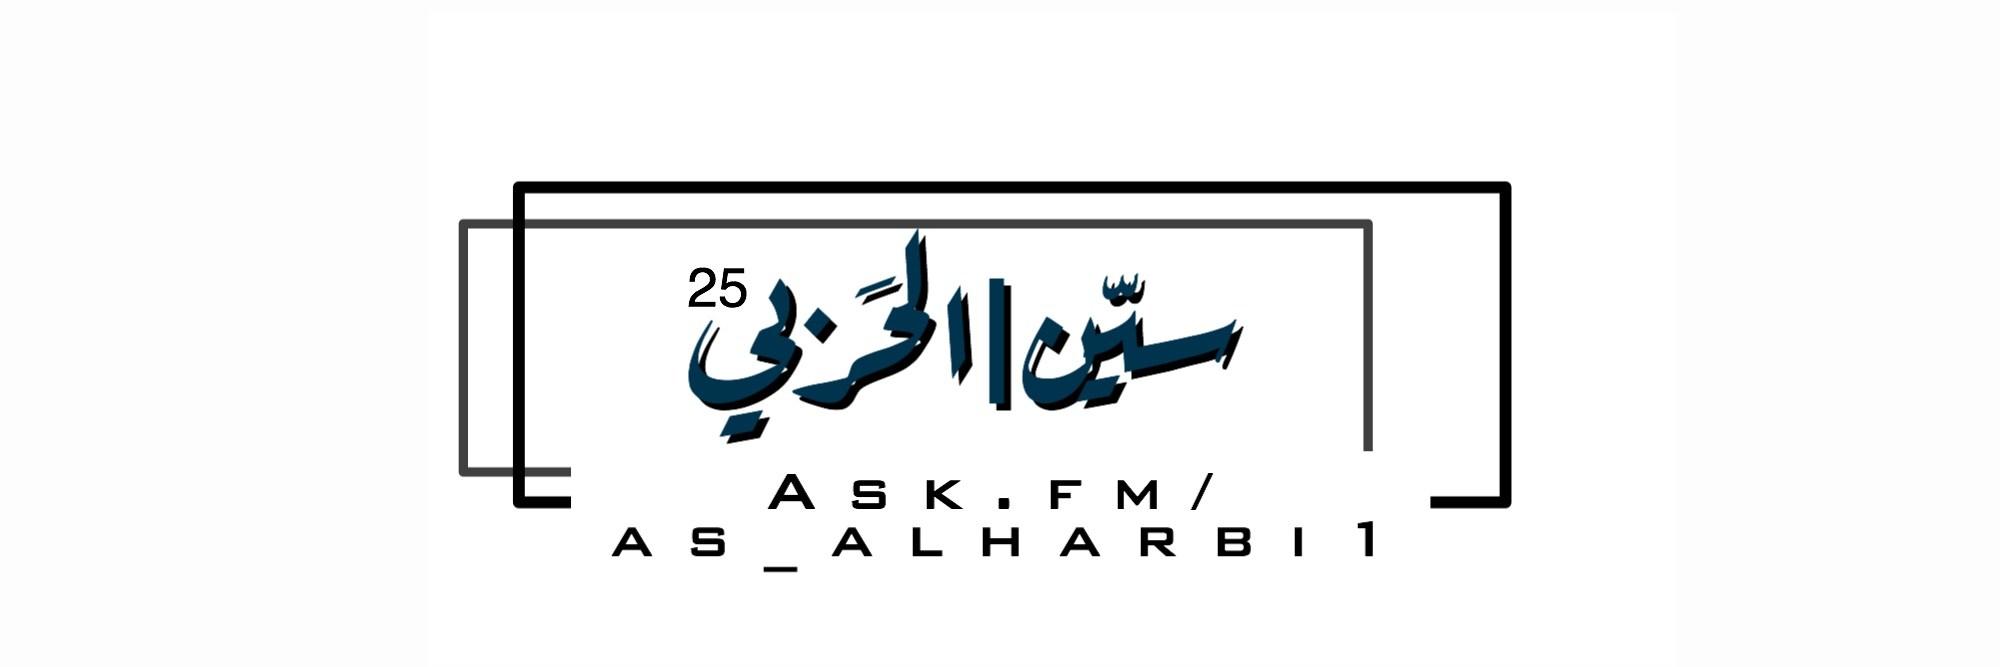 as_alharbi1's Cover Photo